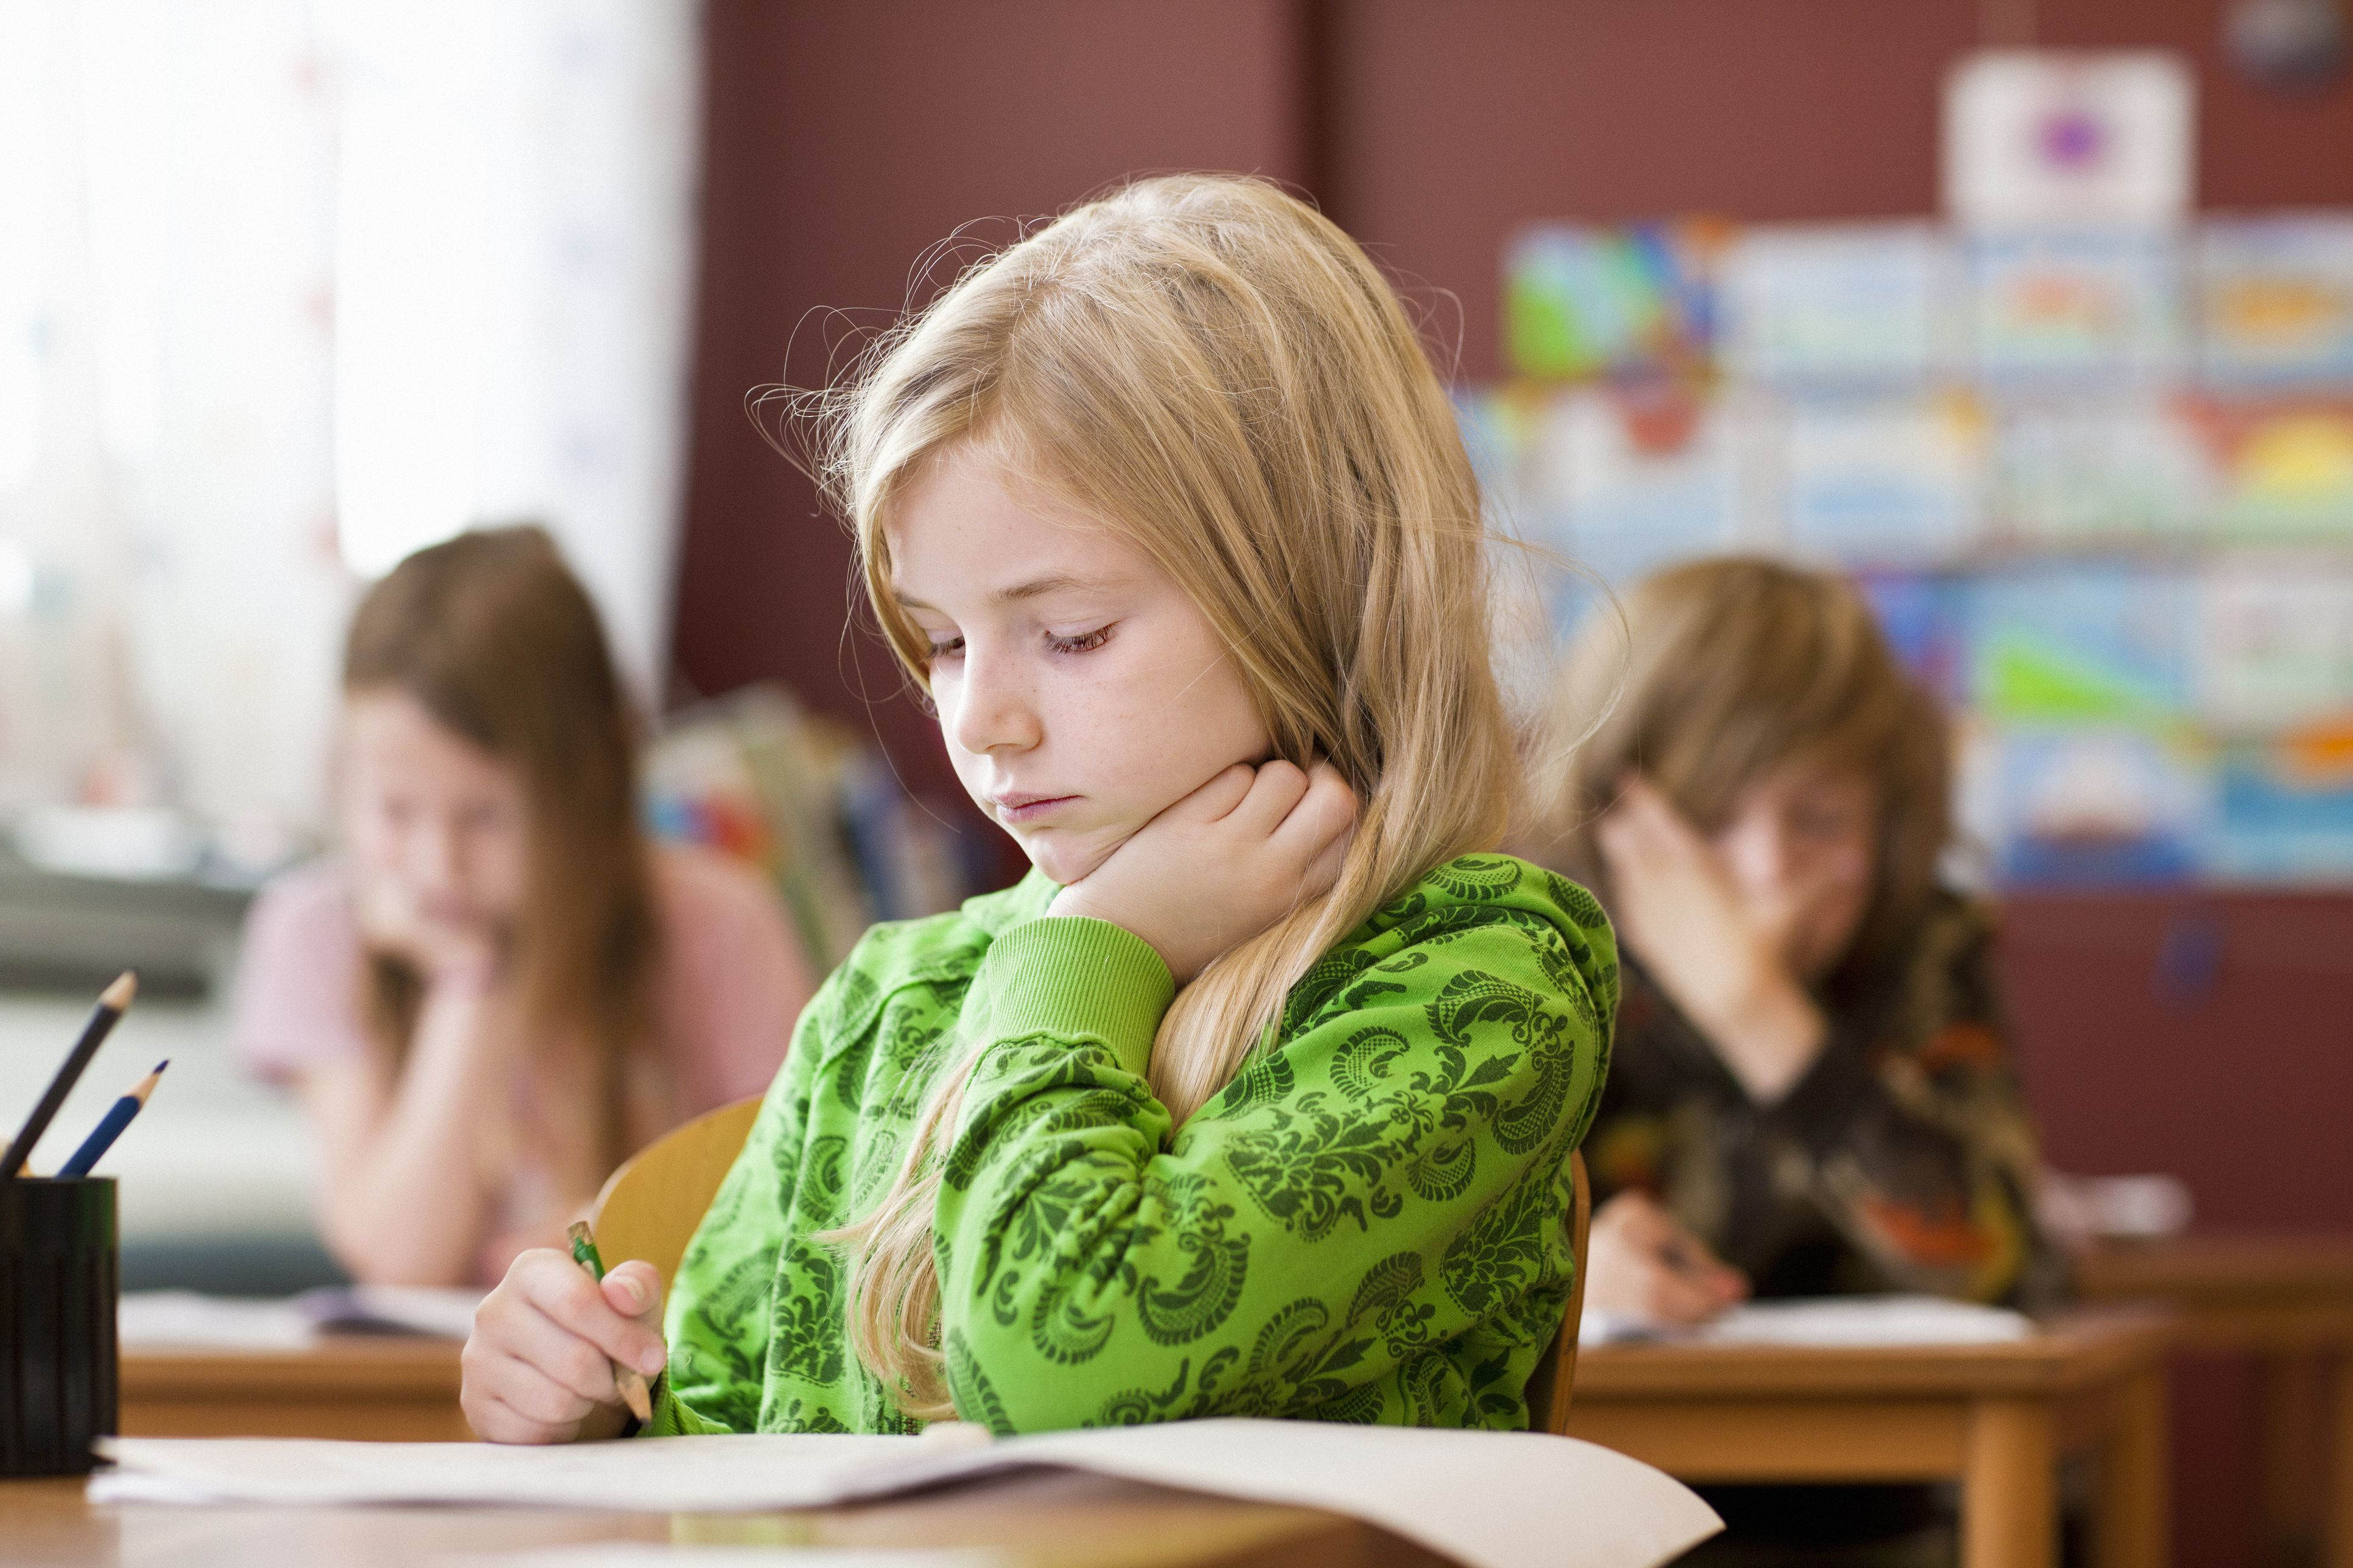 Schoolgirl writing in notebook at classroom